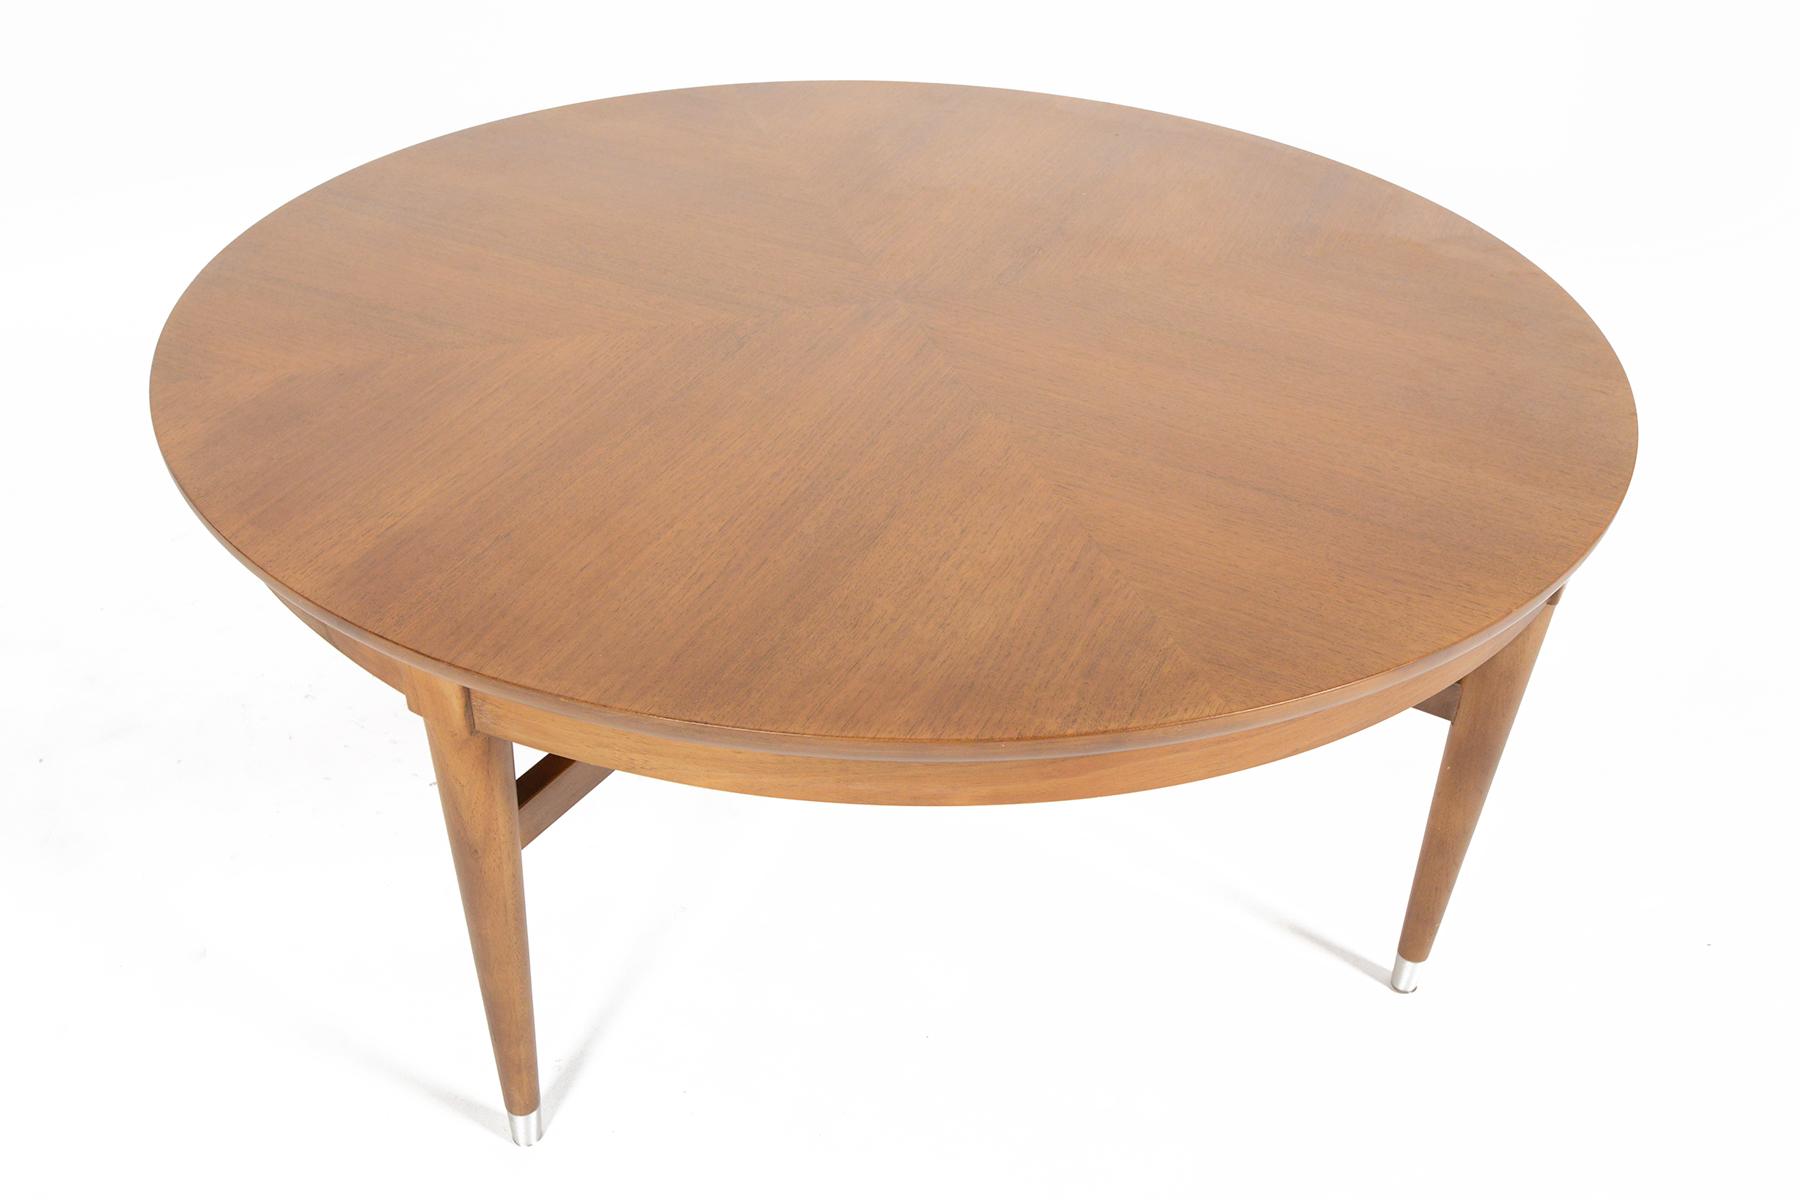 Superieur B.P. John Round Walnut Coffee Table   Image 4 Of 8